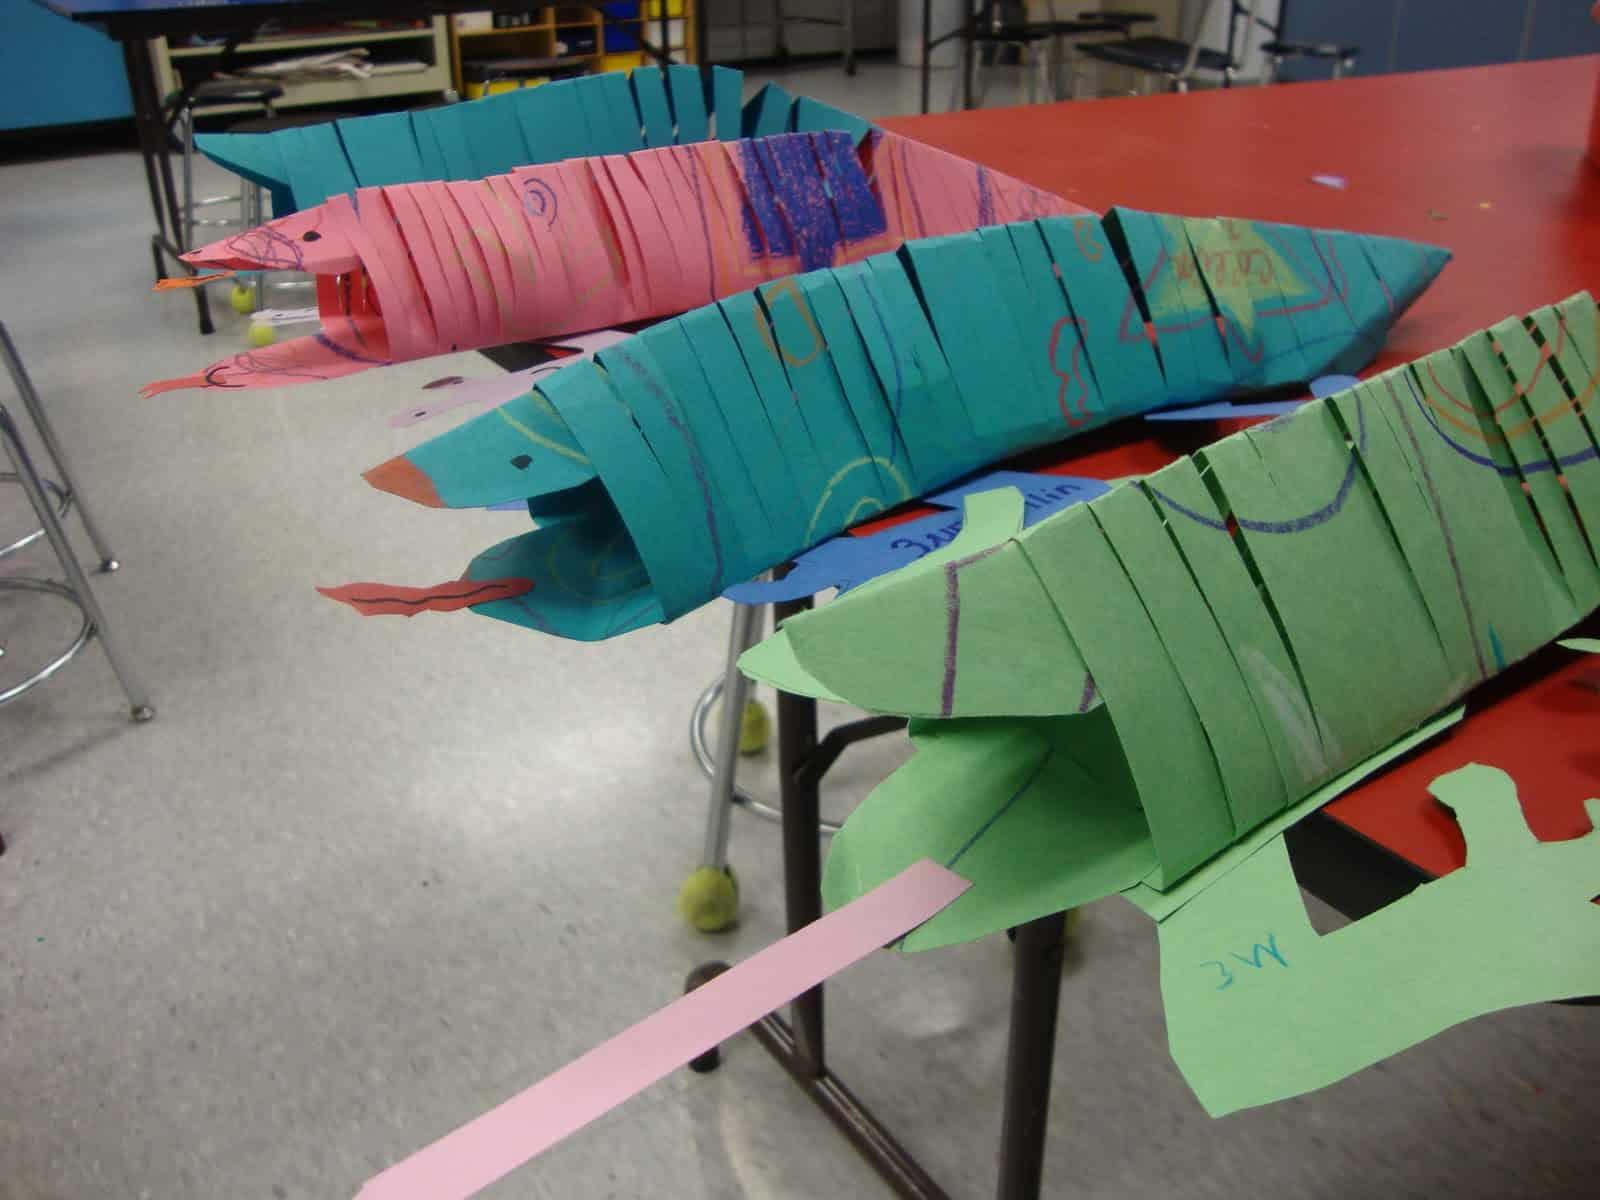 Slinky paper lizards